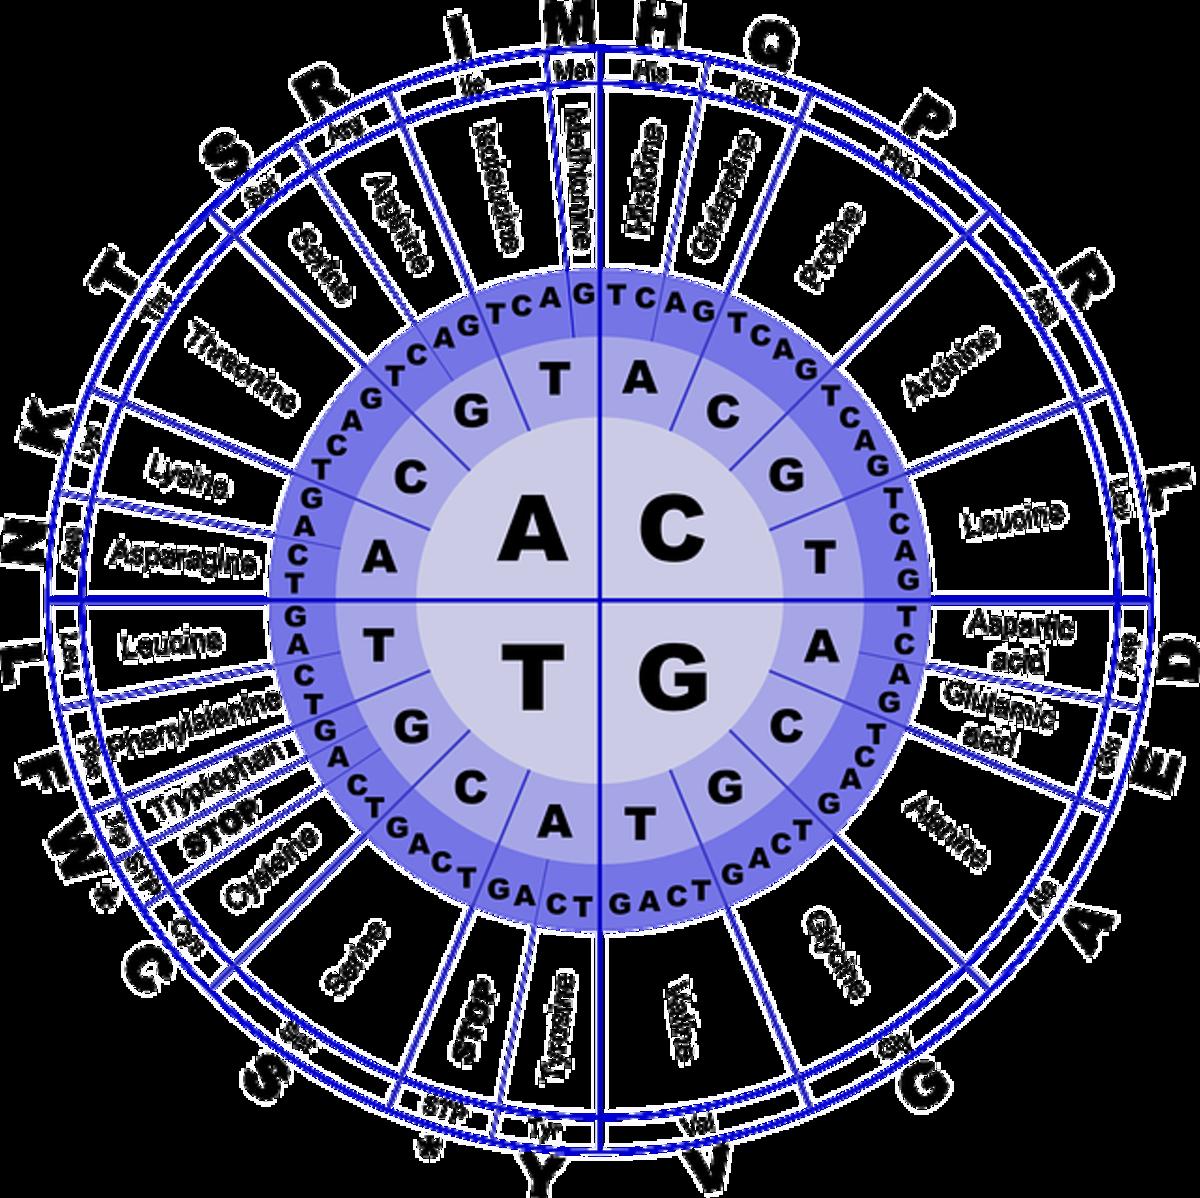 What are the Standard Twenty Amino Acids?